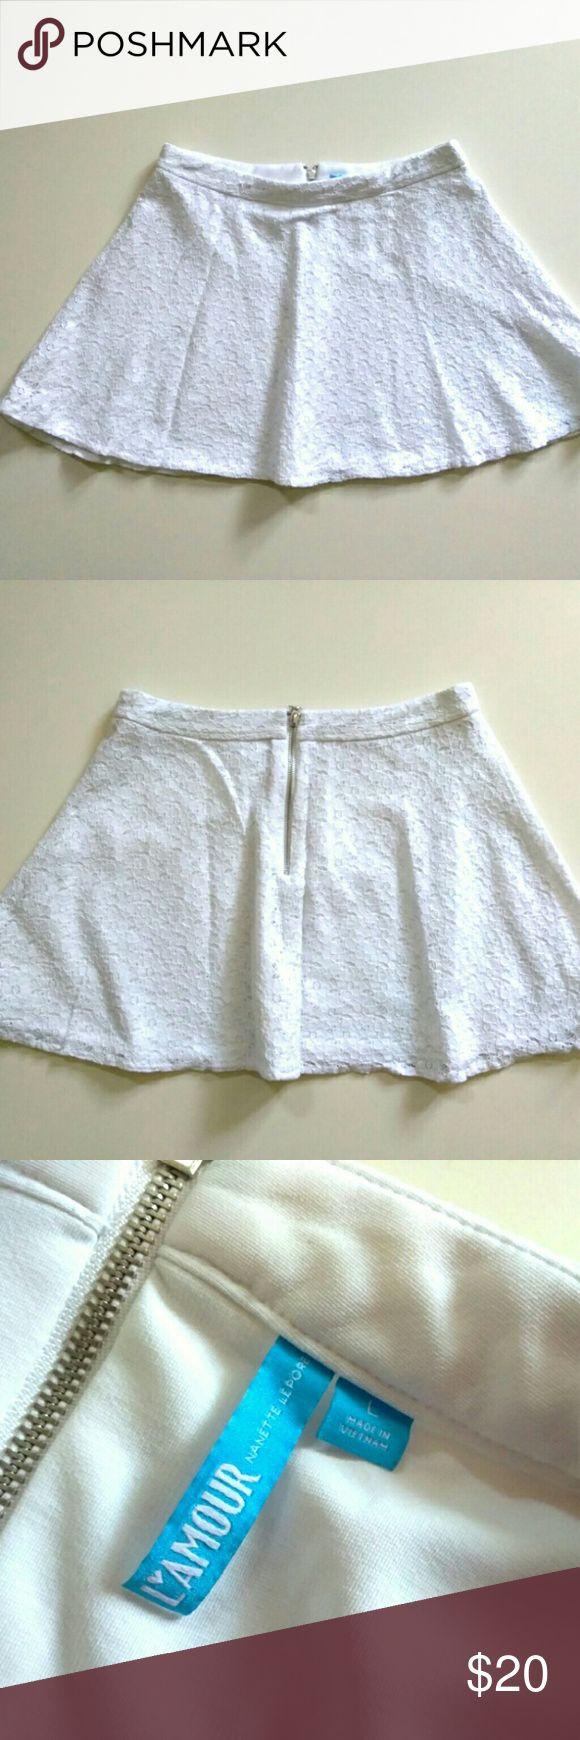 "Nanette Lepore L'Amour white lace mini skirt L Nanette Lepore L'Amour white lace mini skirt L  Length: 15-1/2"" Waist: 15-1/2""   Back zipper Lined  Inv: P2 Nanette Lepore Skirts Mini"